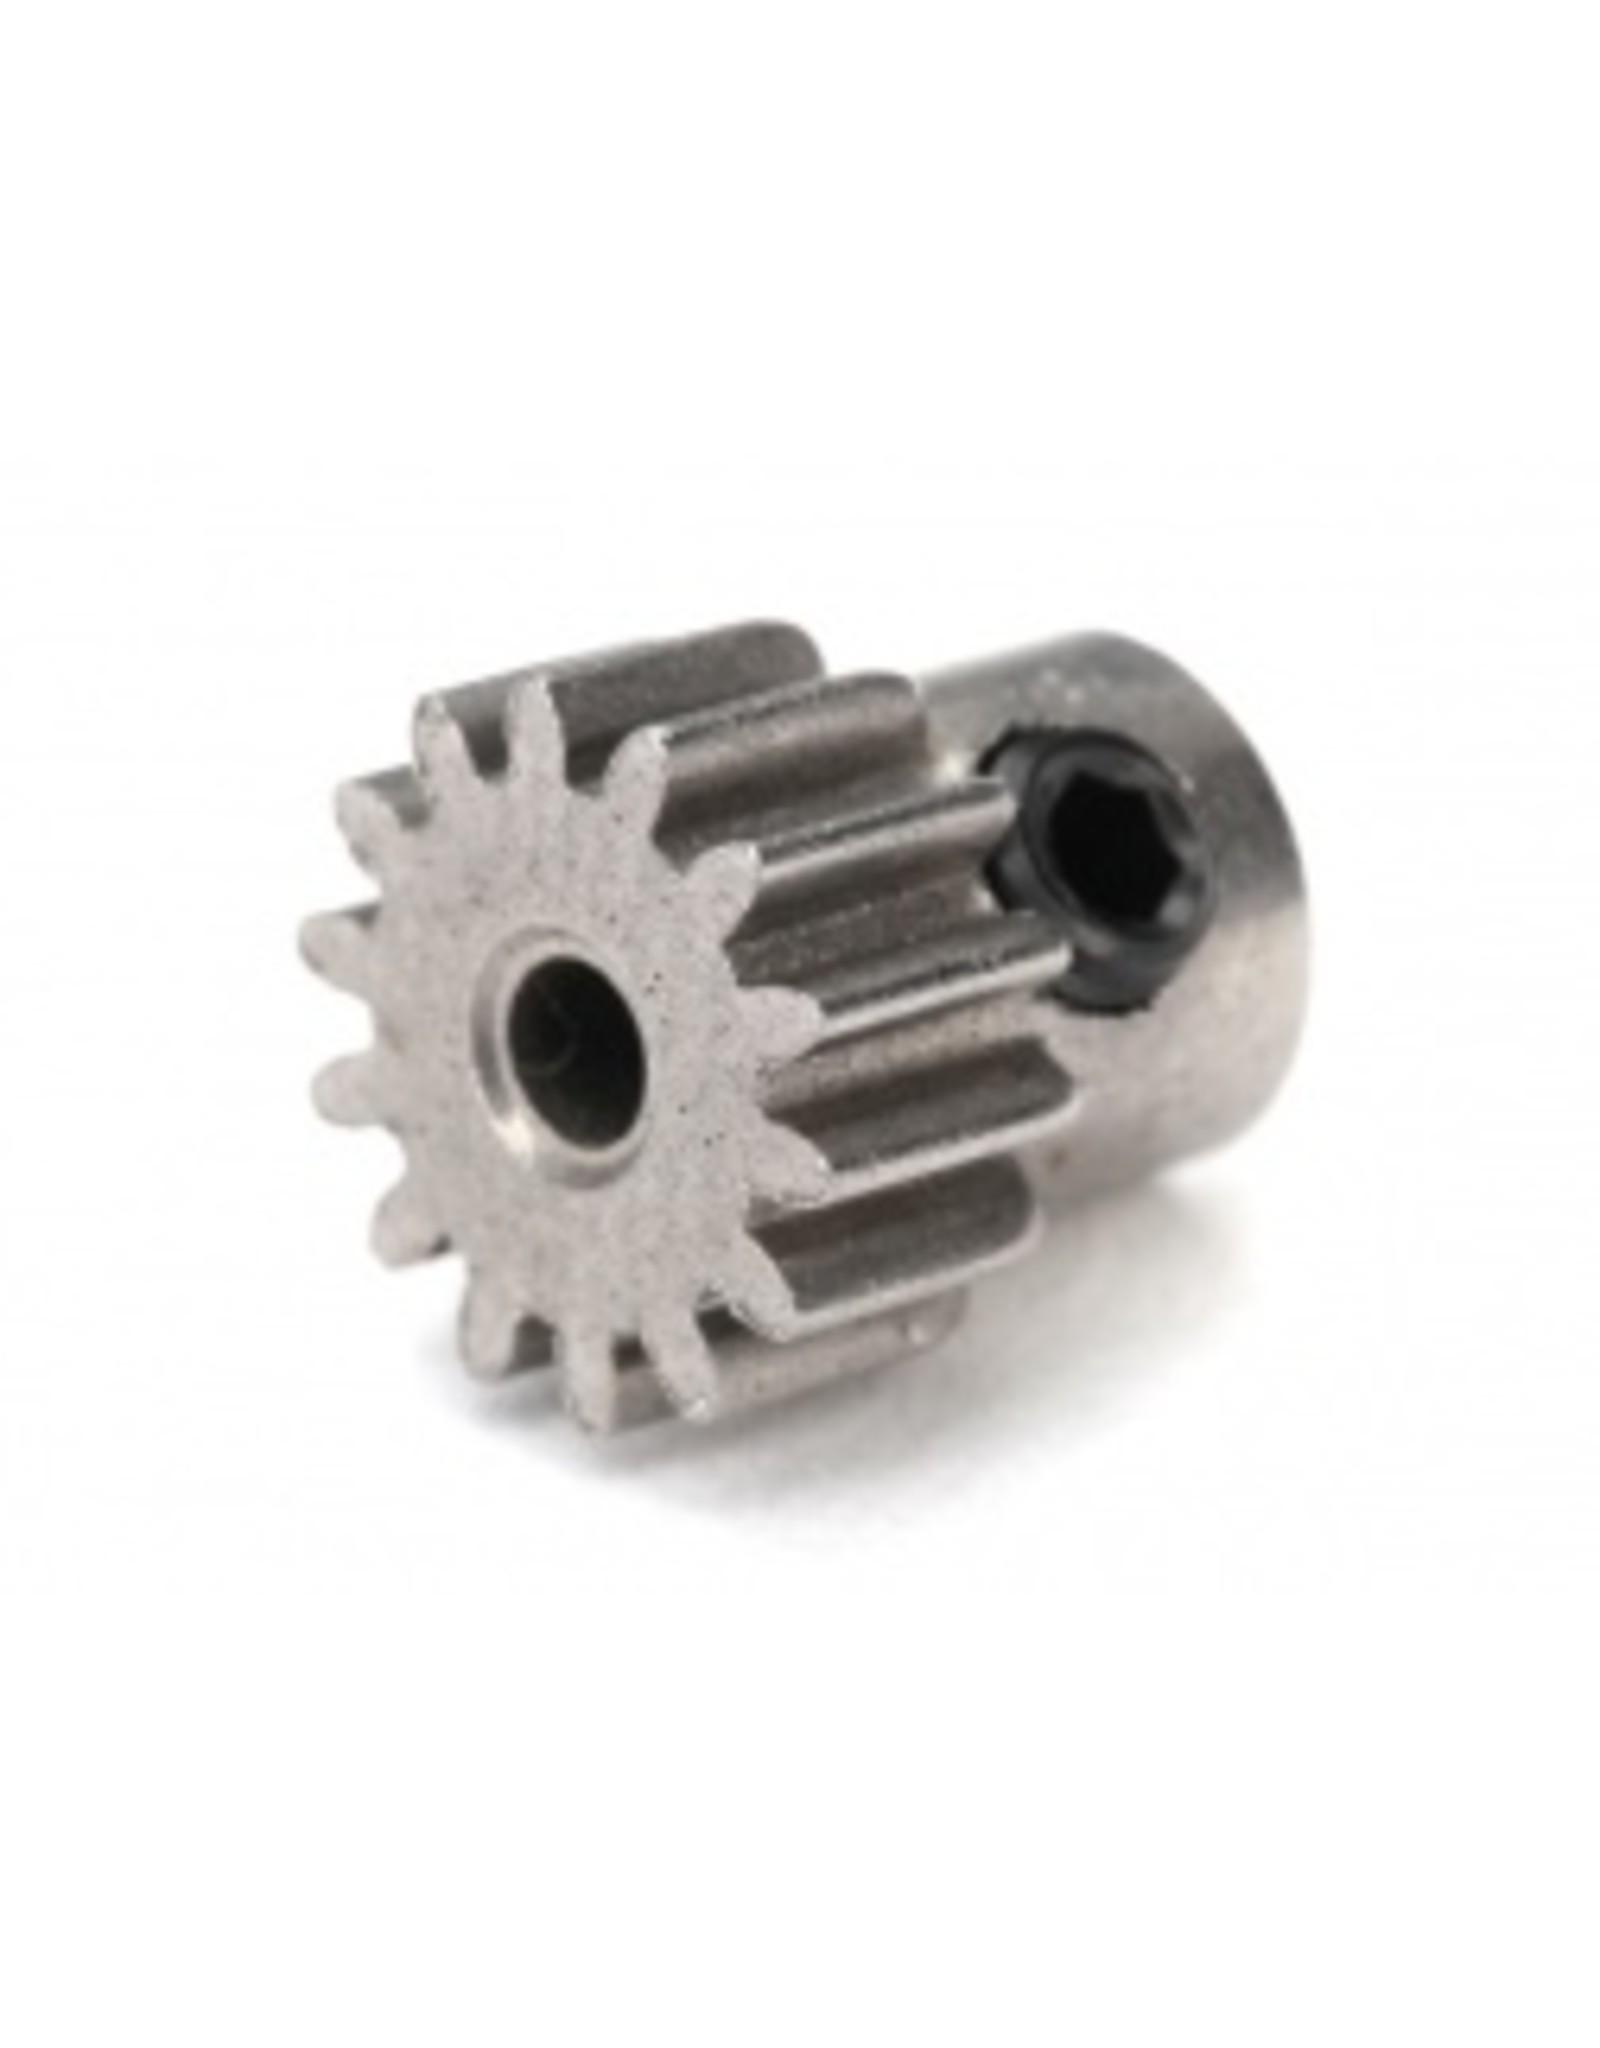 Traxxas Gear, 14-T pinion / set screw (TRA7592)